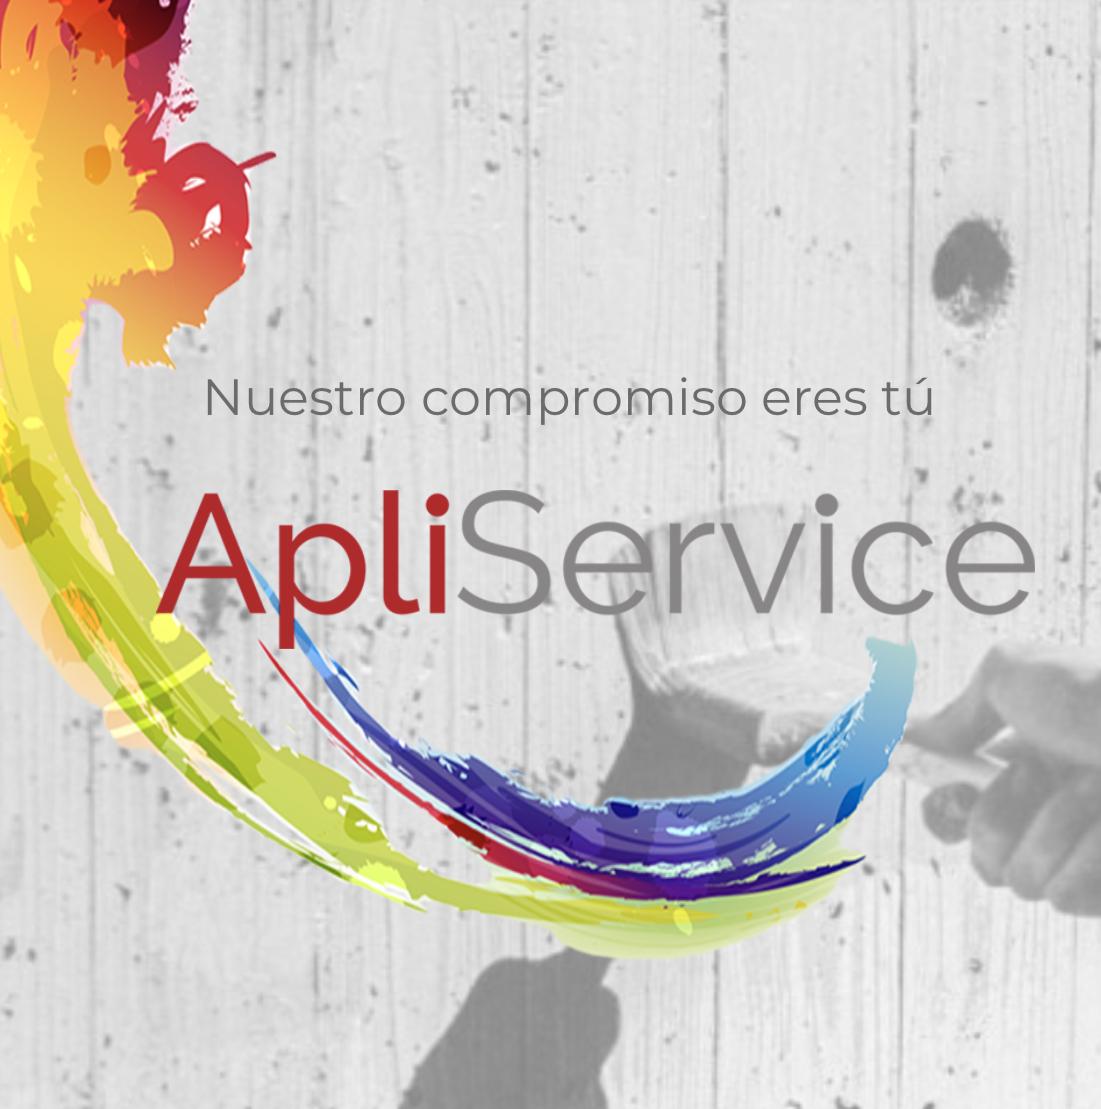 Apliservice